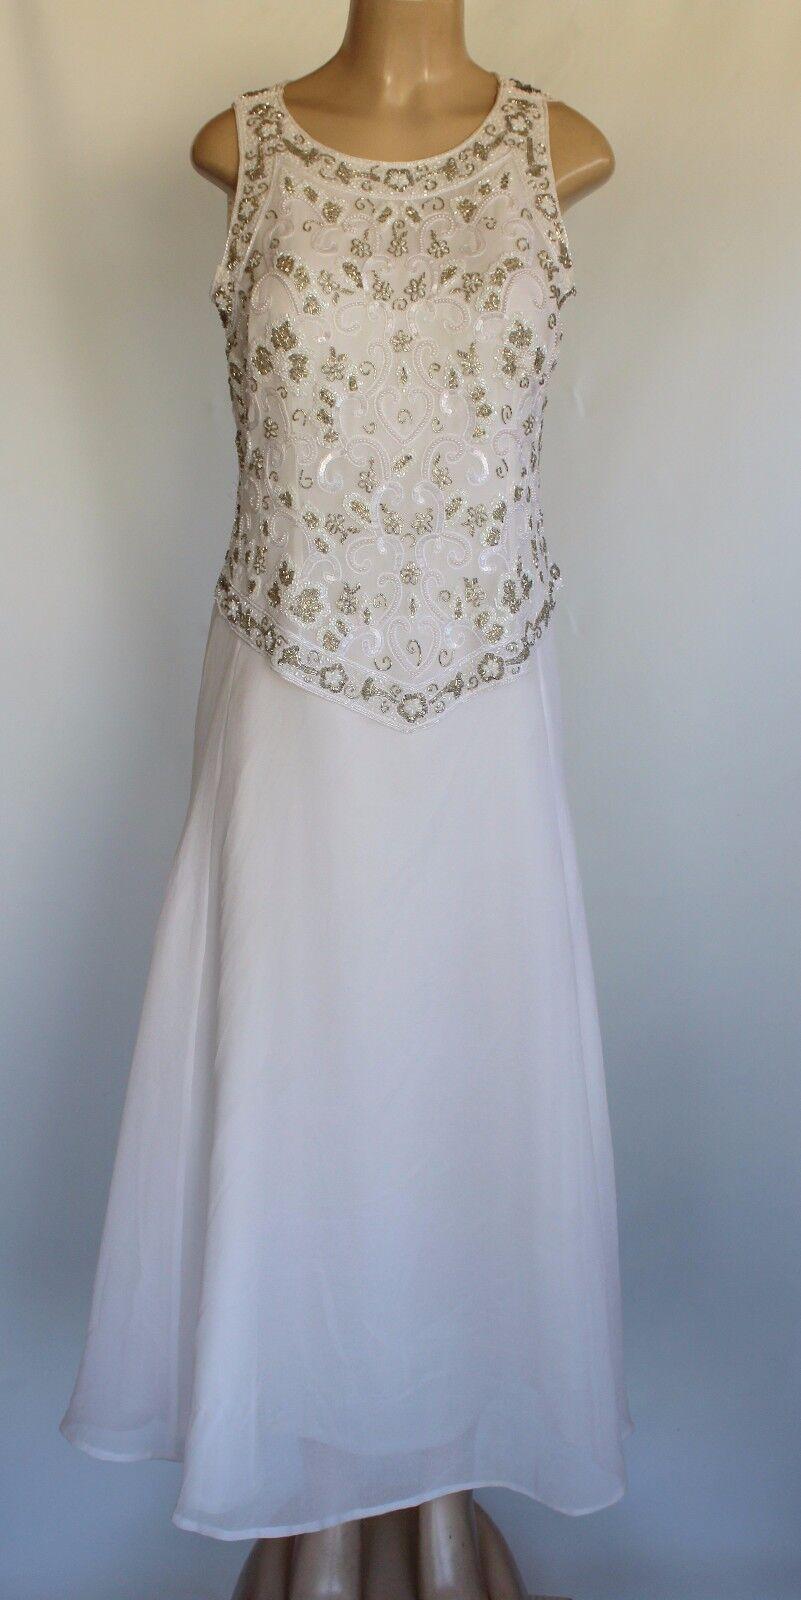 JK ARA New York Women's Dress White Size 10